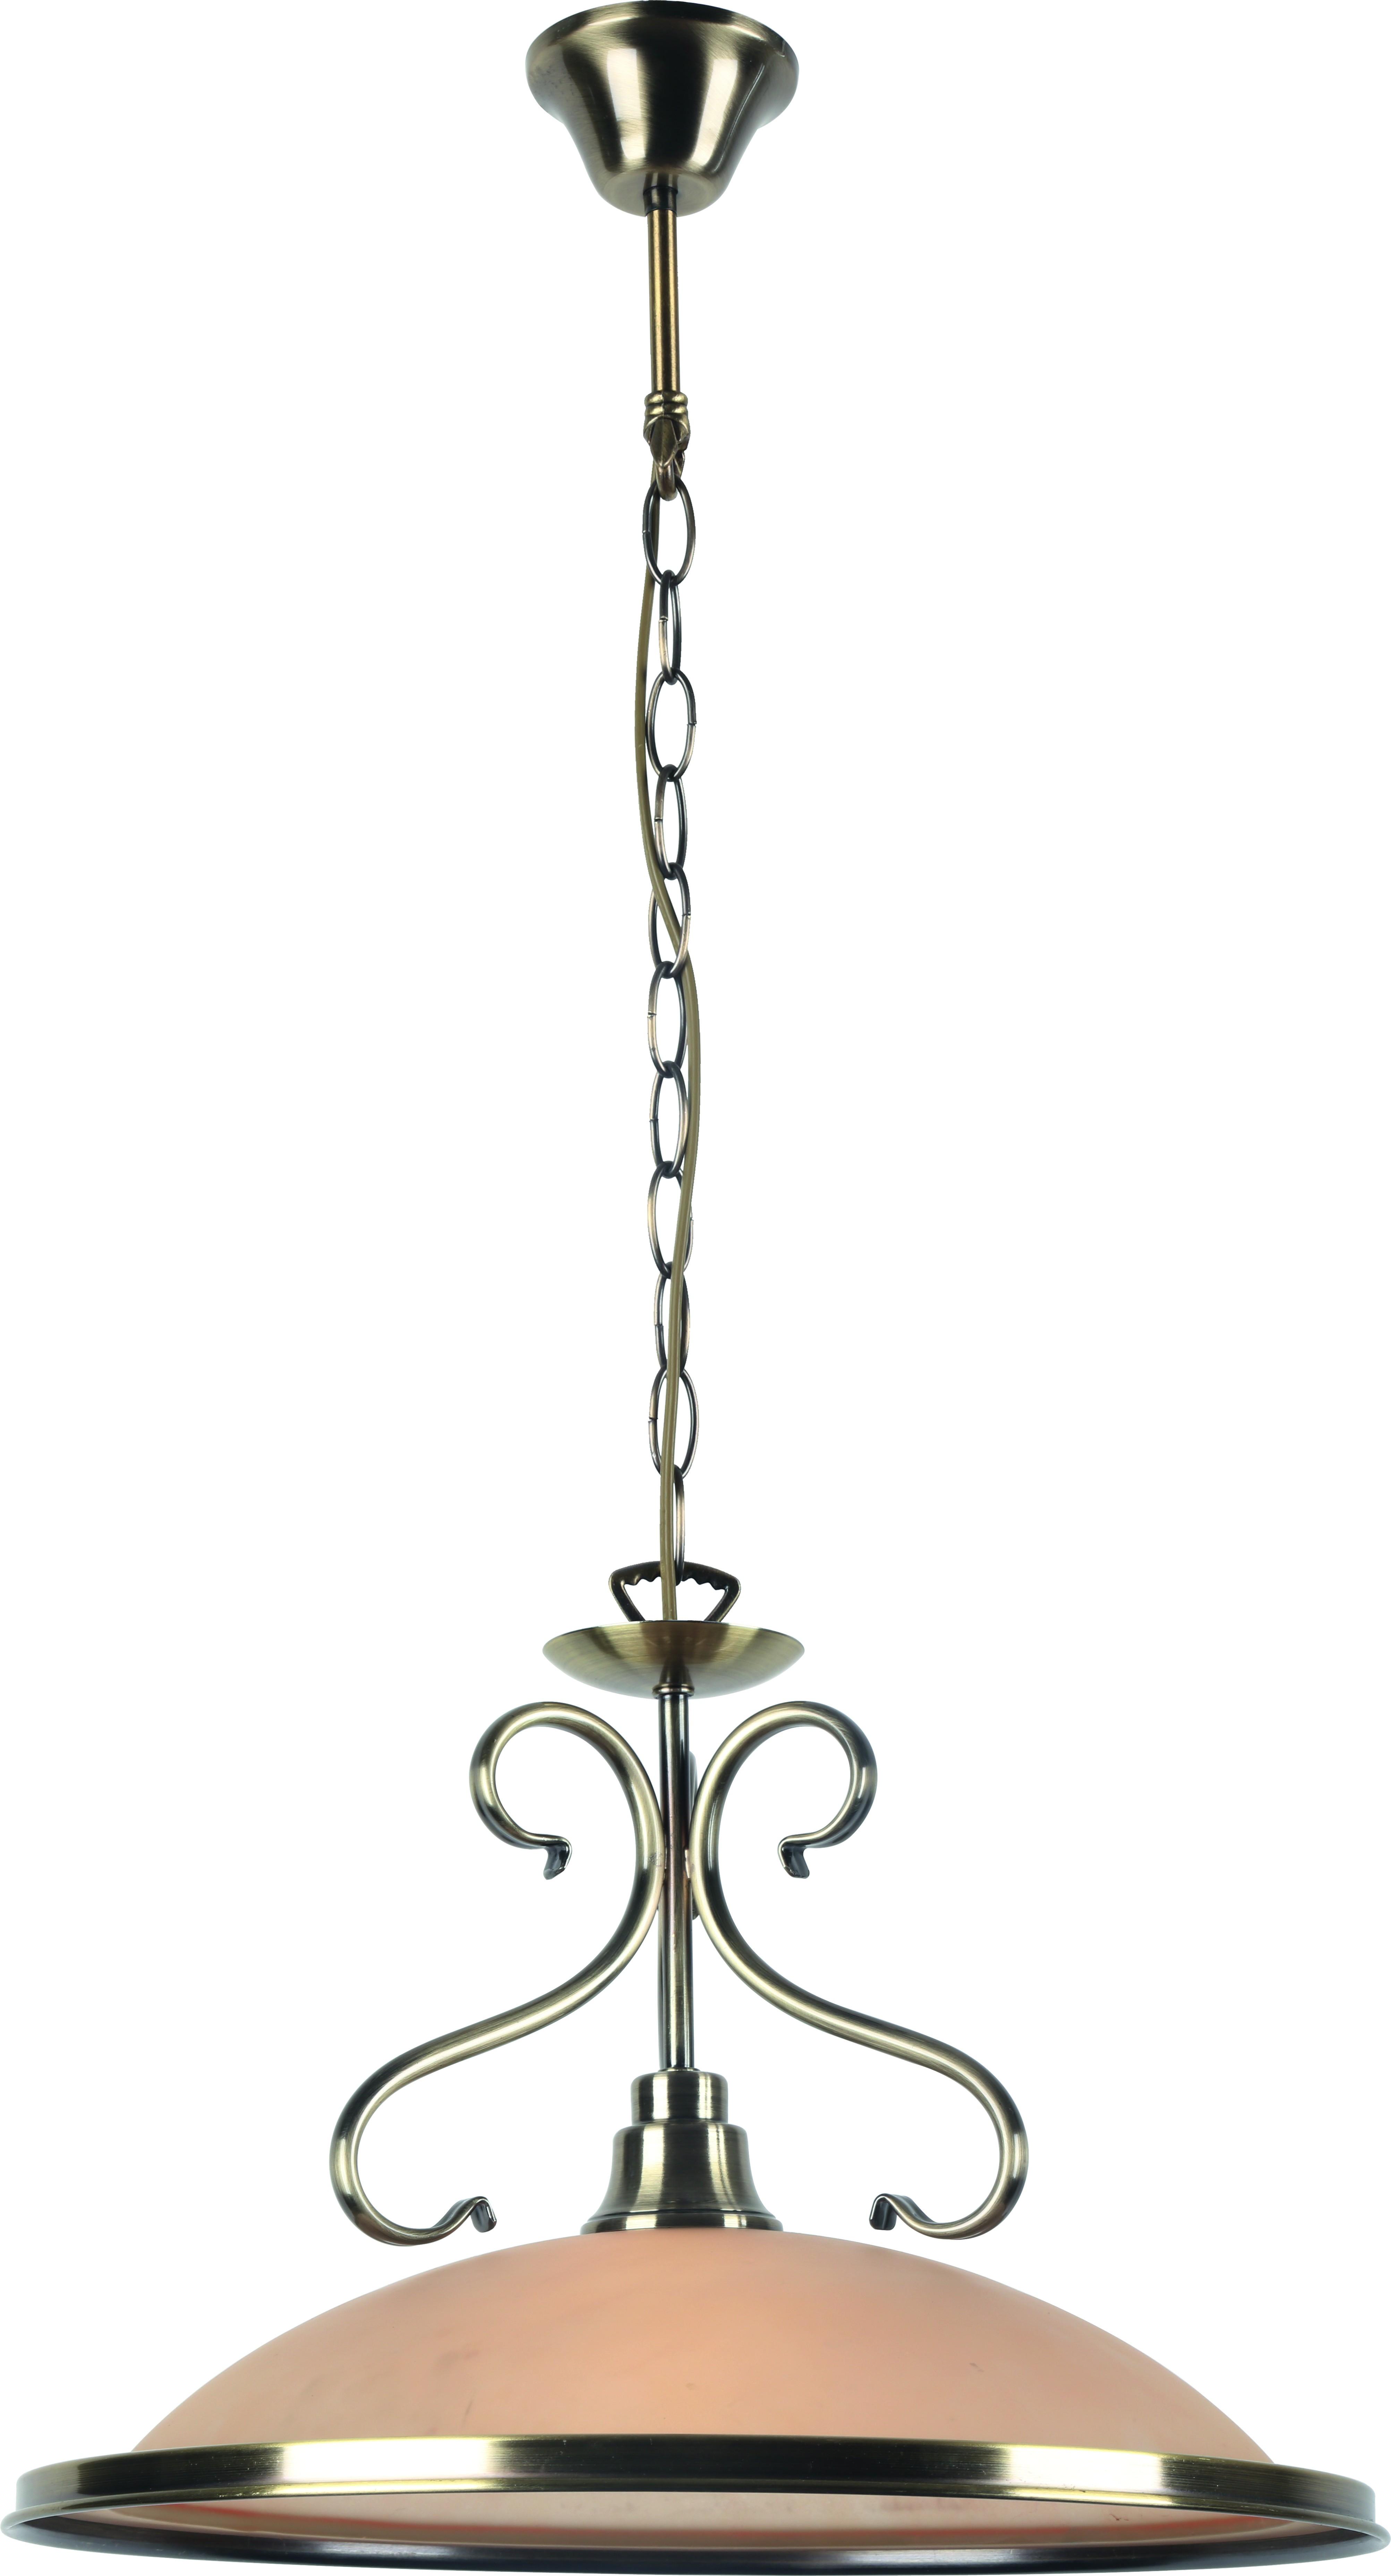 Светильник подвесной Arte lamp A6905sp-1ab цена и фото